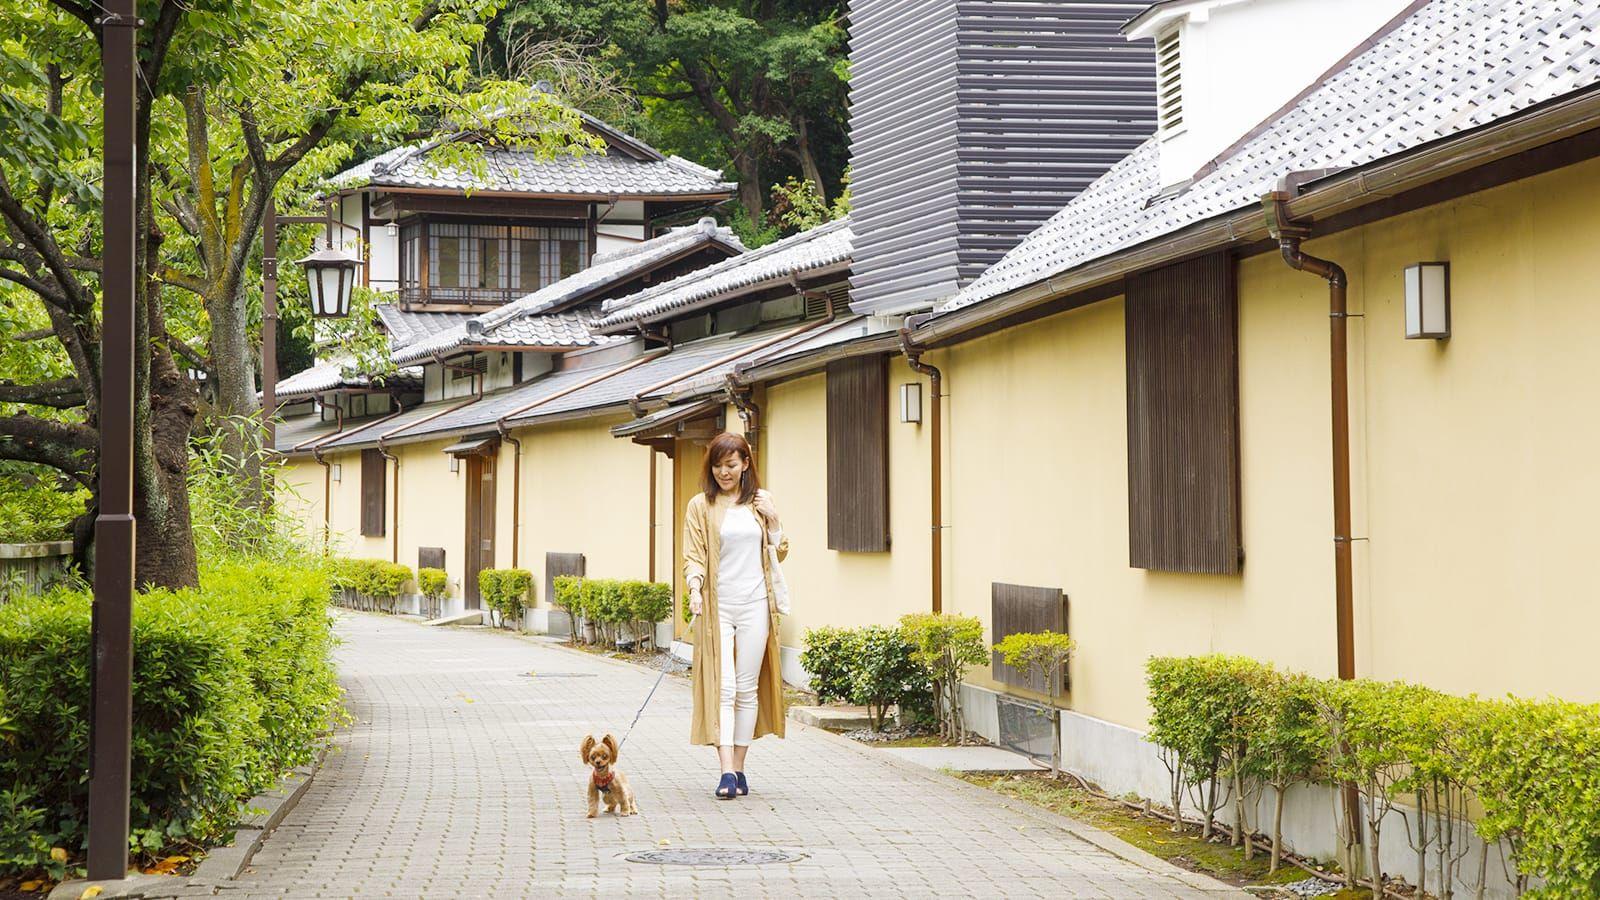 Moon Type Room With Open Air Bath Guestroom Hakone Ginyu Spa Resort Miyanoshita Hakone Ginyu 箱根 露天風呂 吟遊